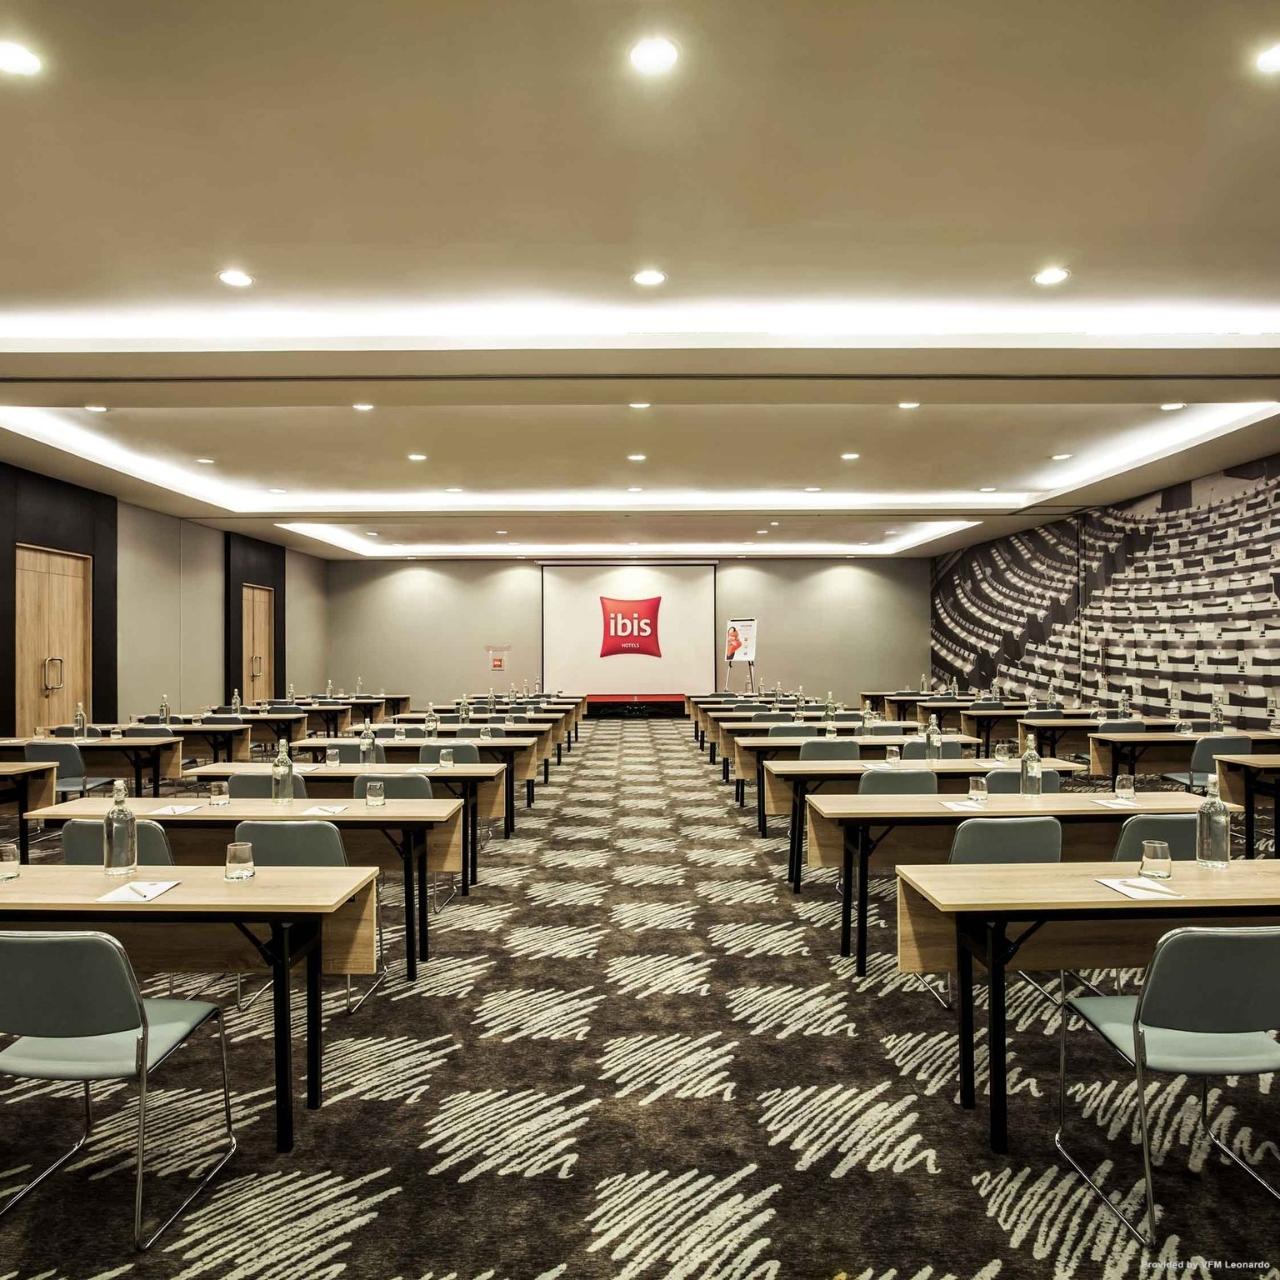 Hotel Ibis Jakarta Harmoni 3 Hrs Star Hotel In Jakarta